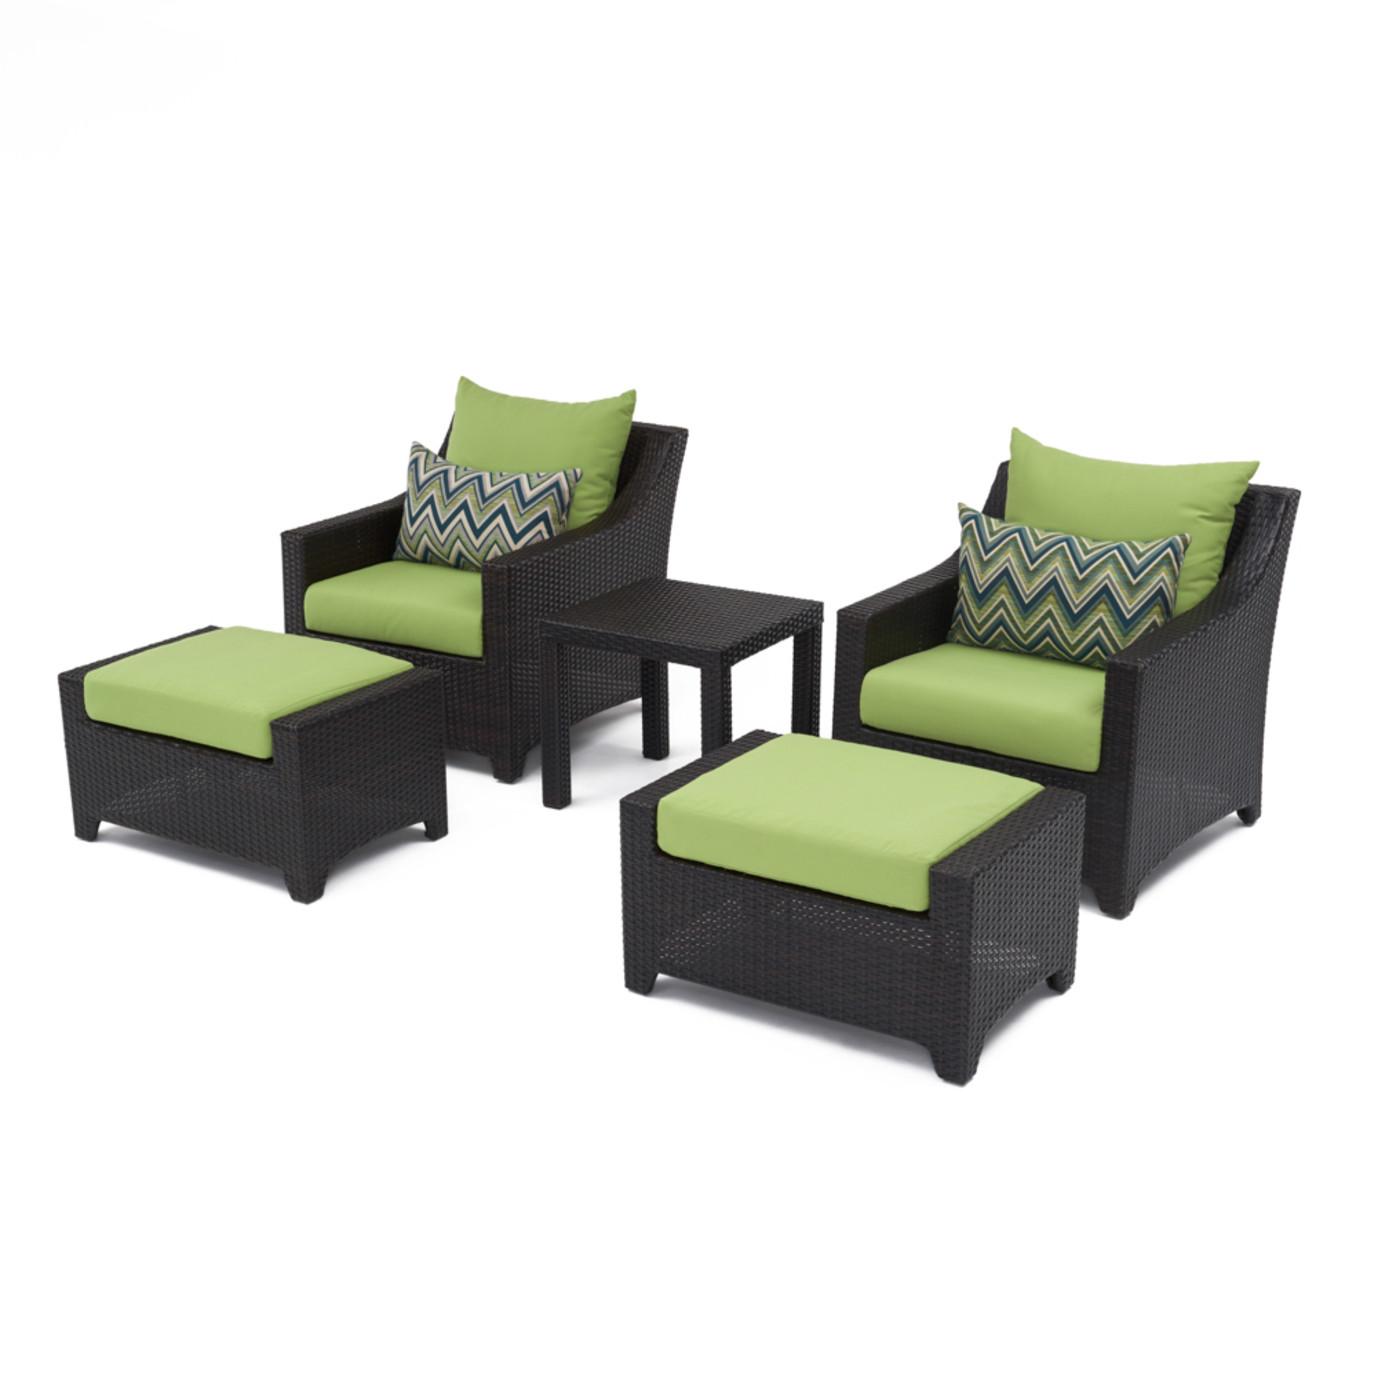 Deco™ 5pc Club Chair and Ottoman Set - Ginkgo Green